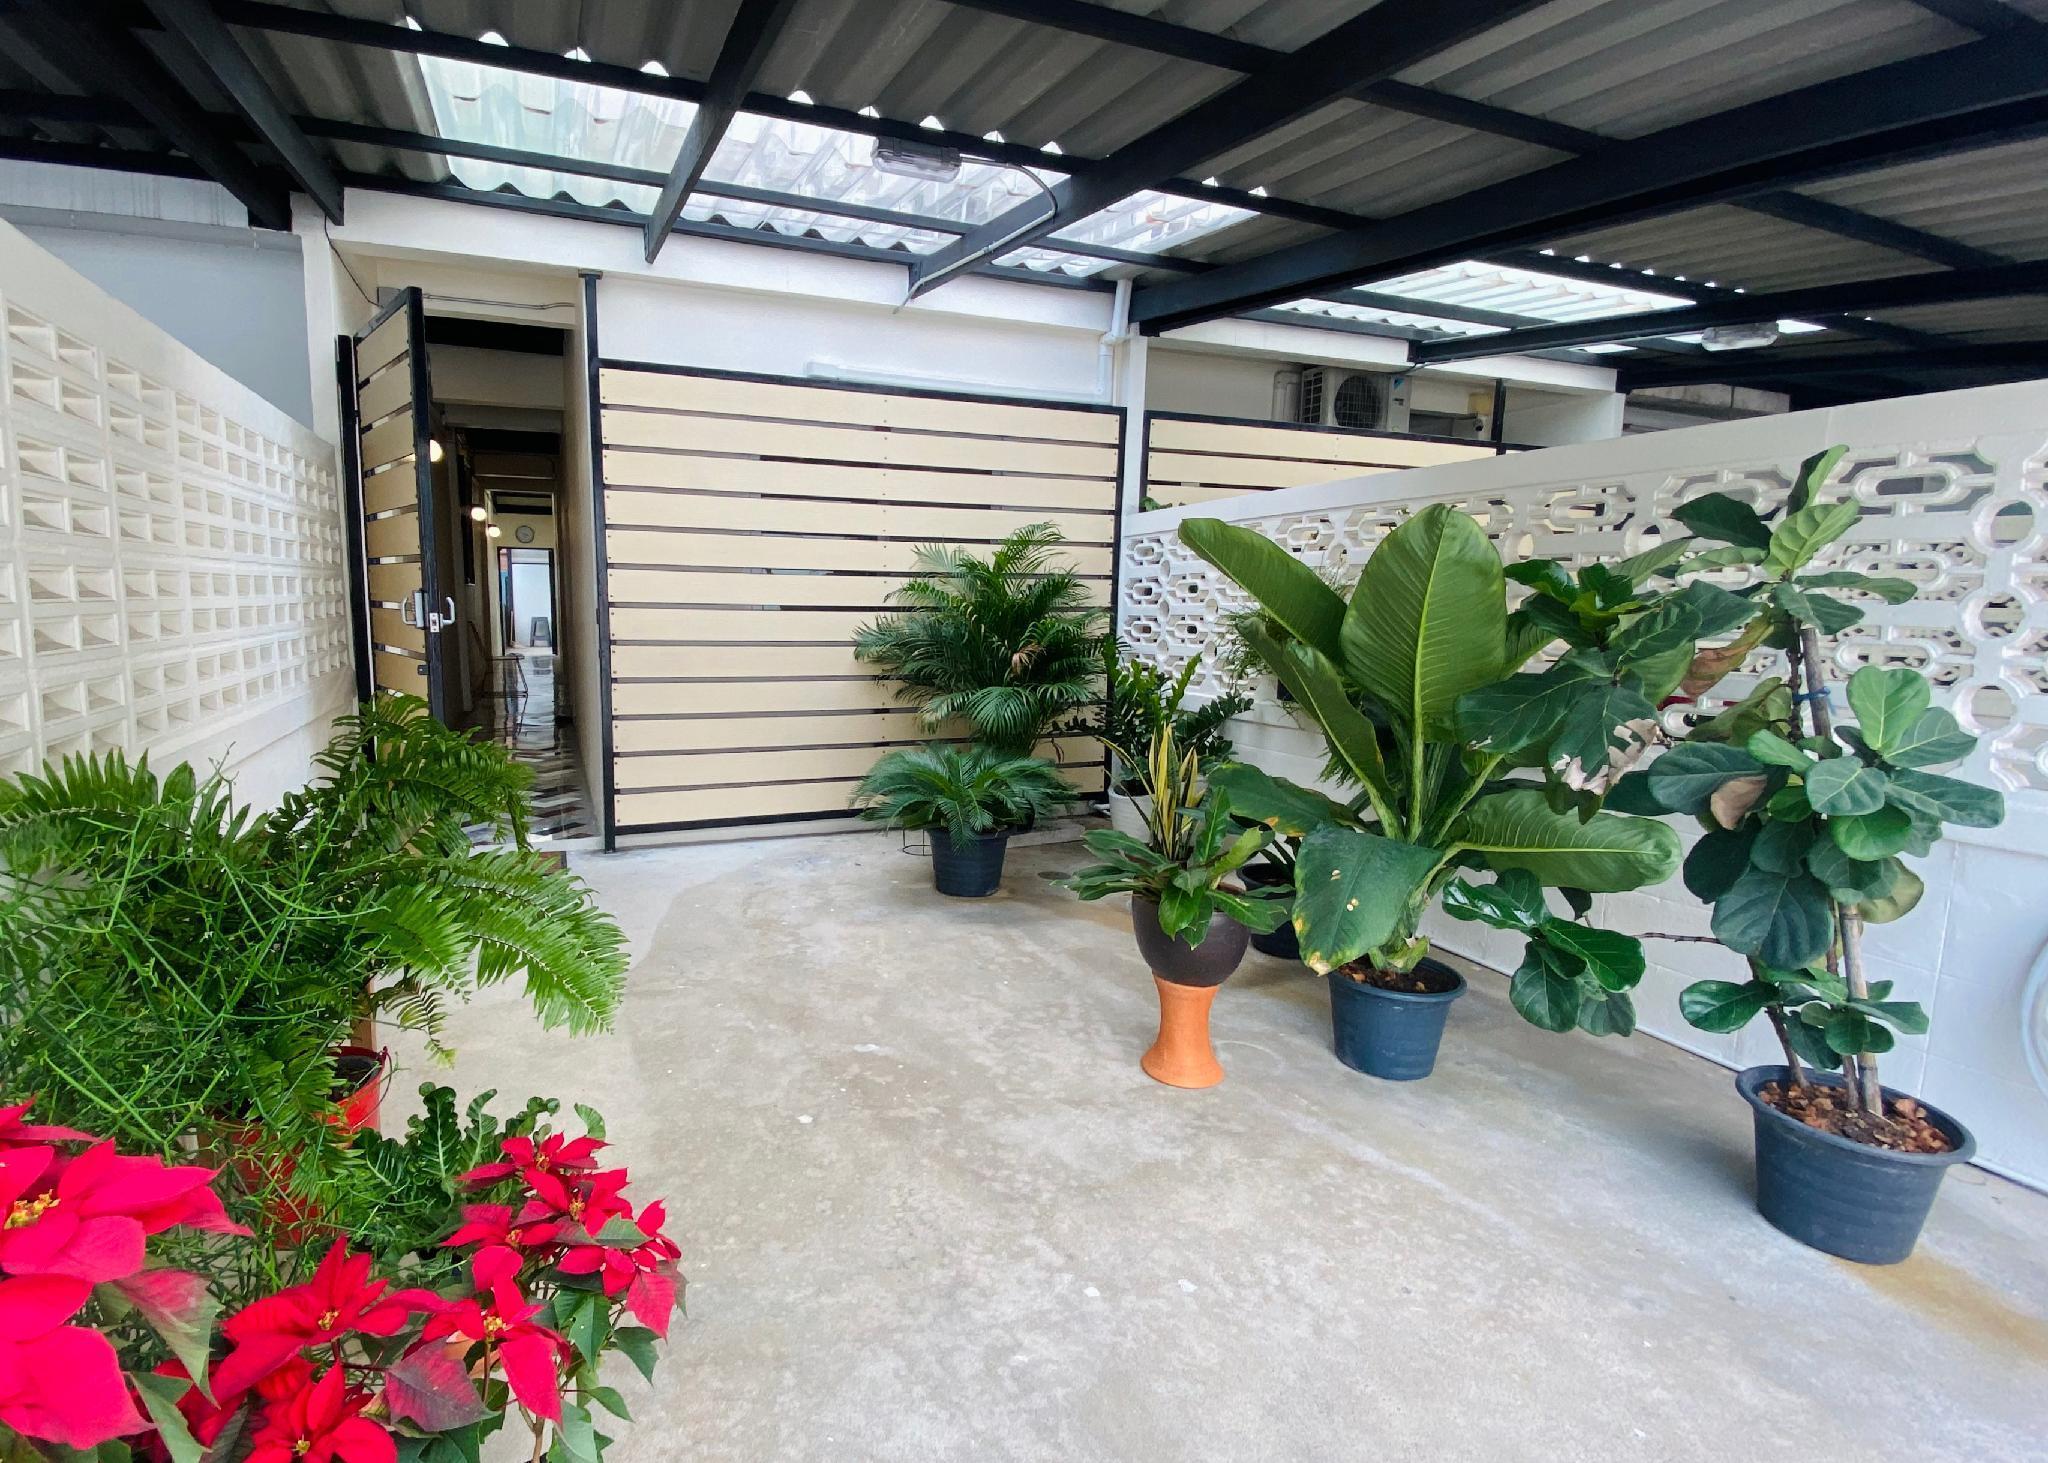 DesignerHouse* 4BRs POOL Bangkok*BTS*IconSiam บ้านเดี่ยว 4 ห้องนอน 4 ห้องน้ำส่วนตัว ขนาด 100 ตร.ม. – ธนบุรี